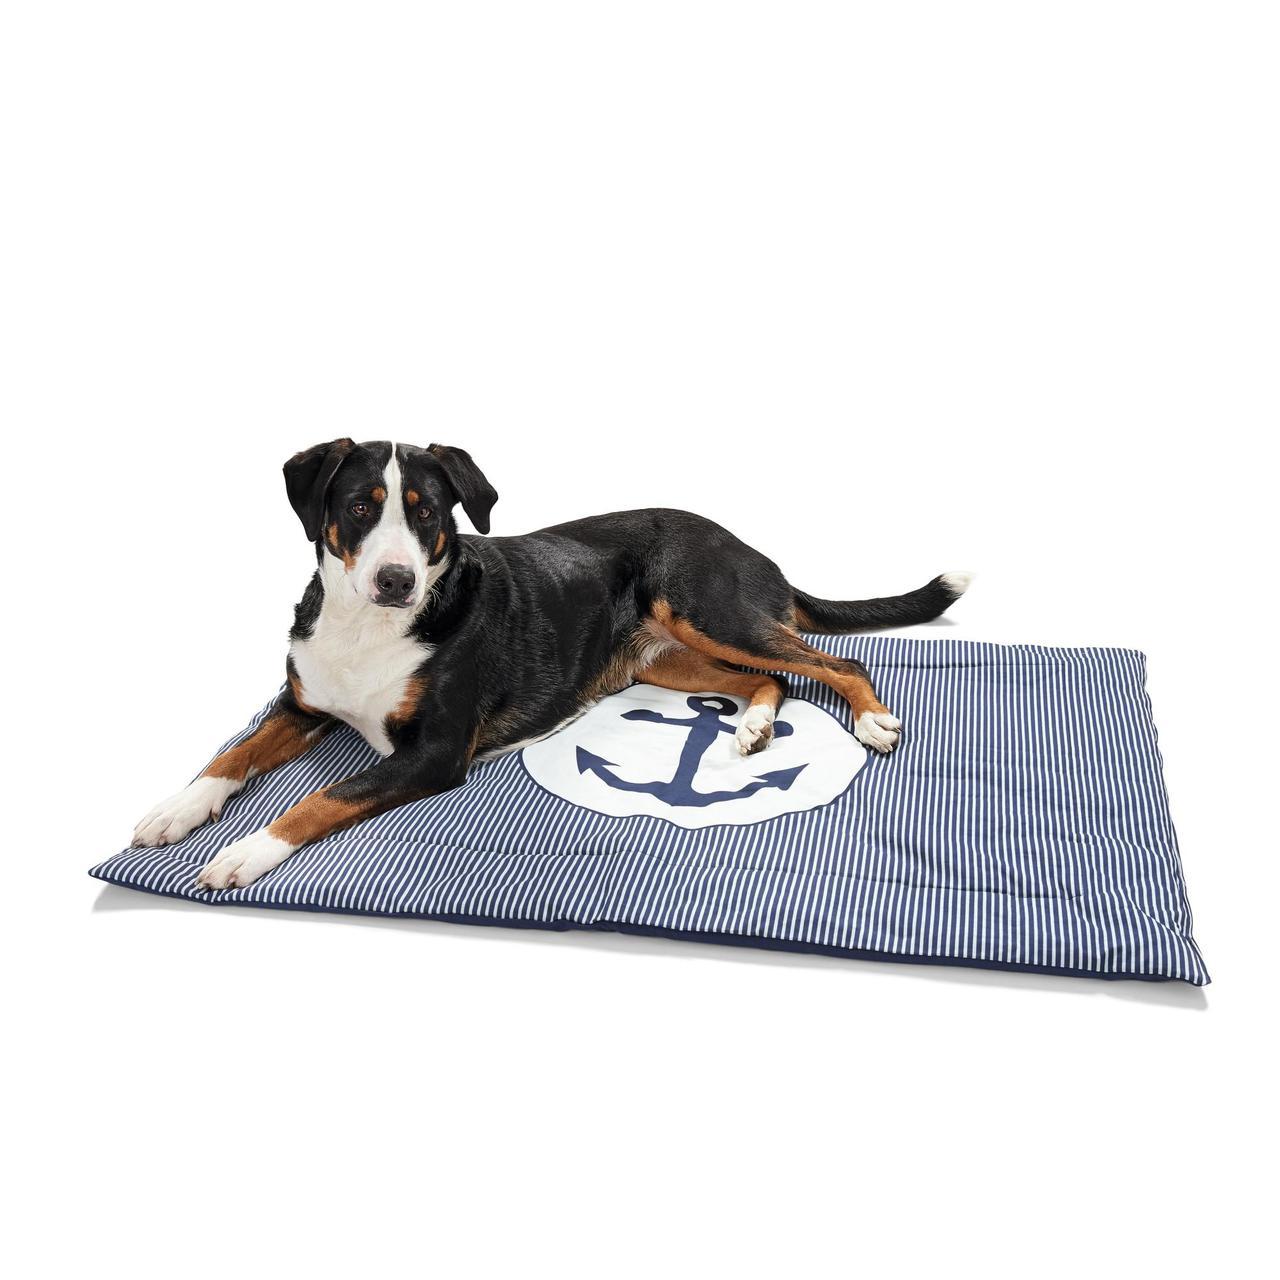 An image of Hunter Dog Blanket Midlum 120 x 80cm